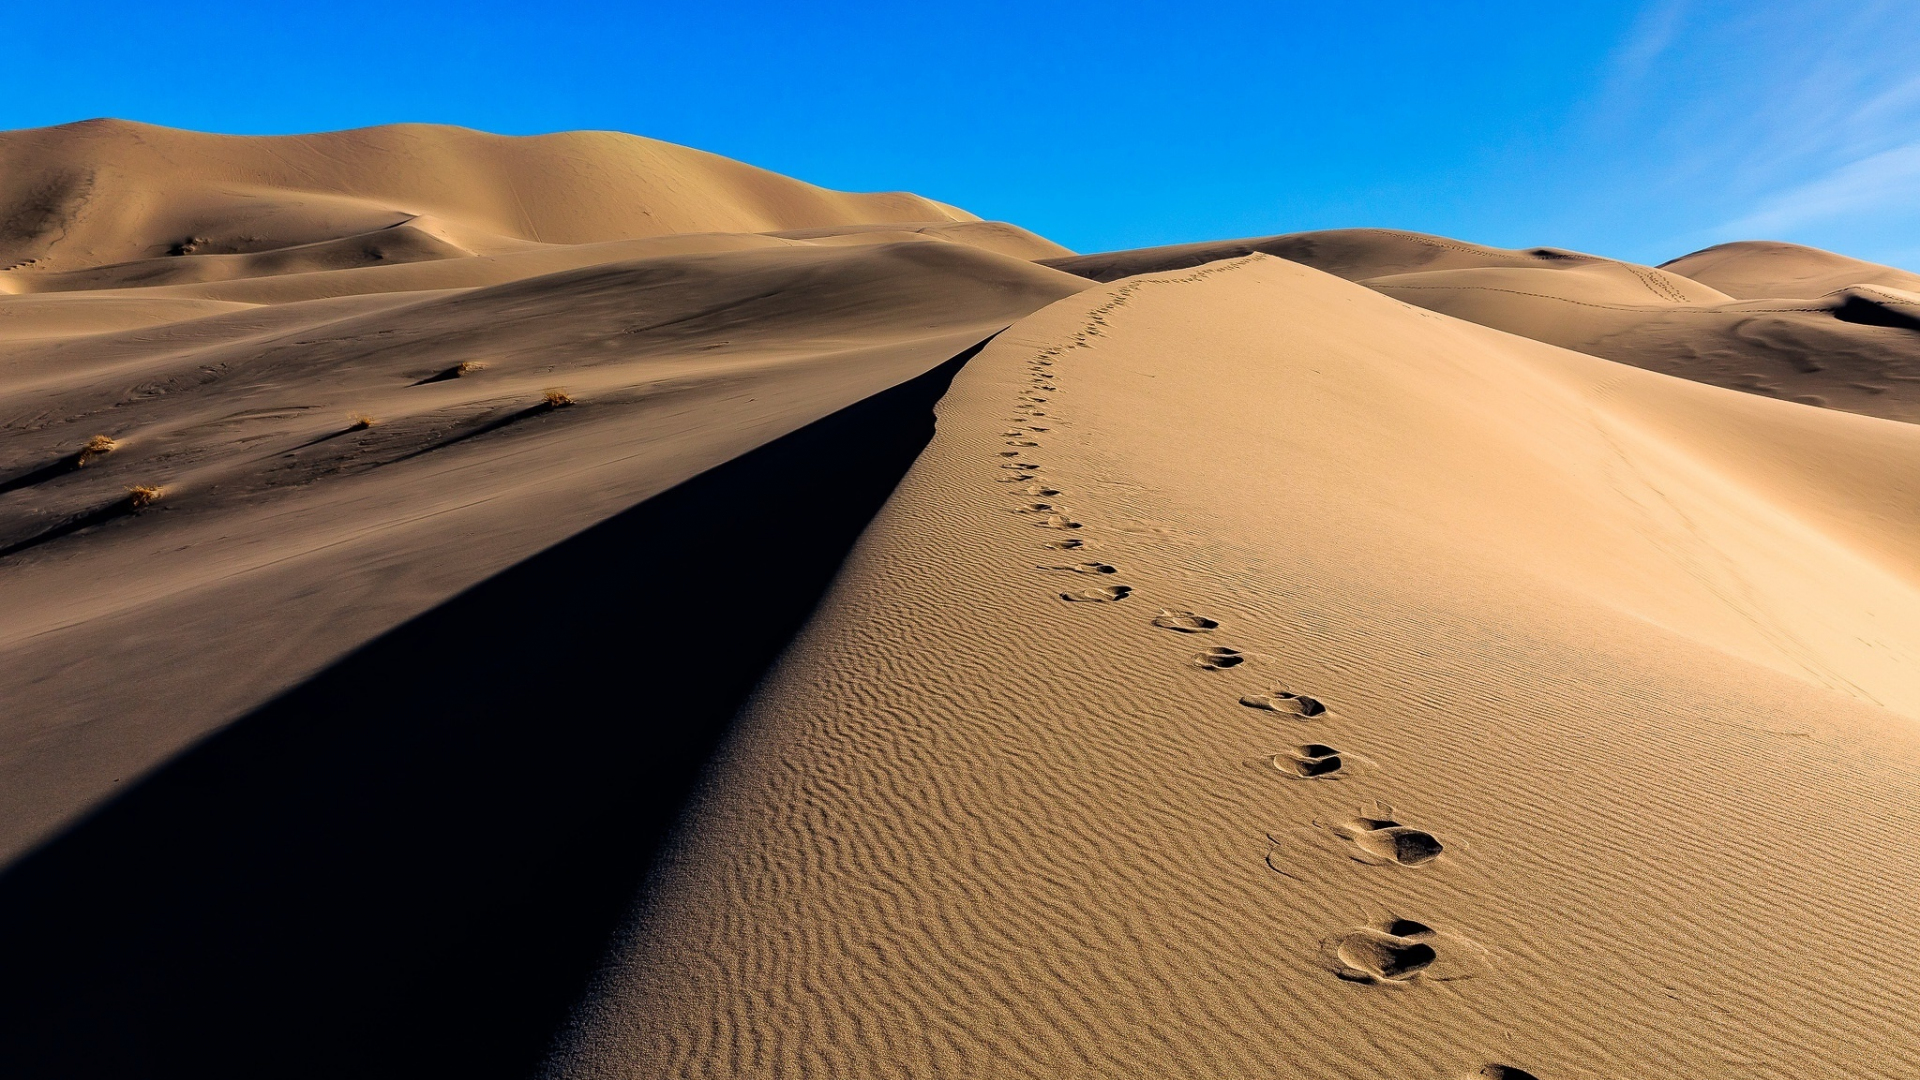 Download 1920x1080 Wallpaper Desert Camel S Footprint Sand Full Hd Hdtv Fhd 1080p 1920x1080 Hd Image Background 5523